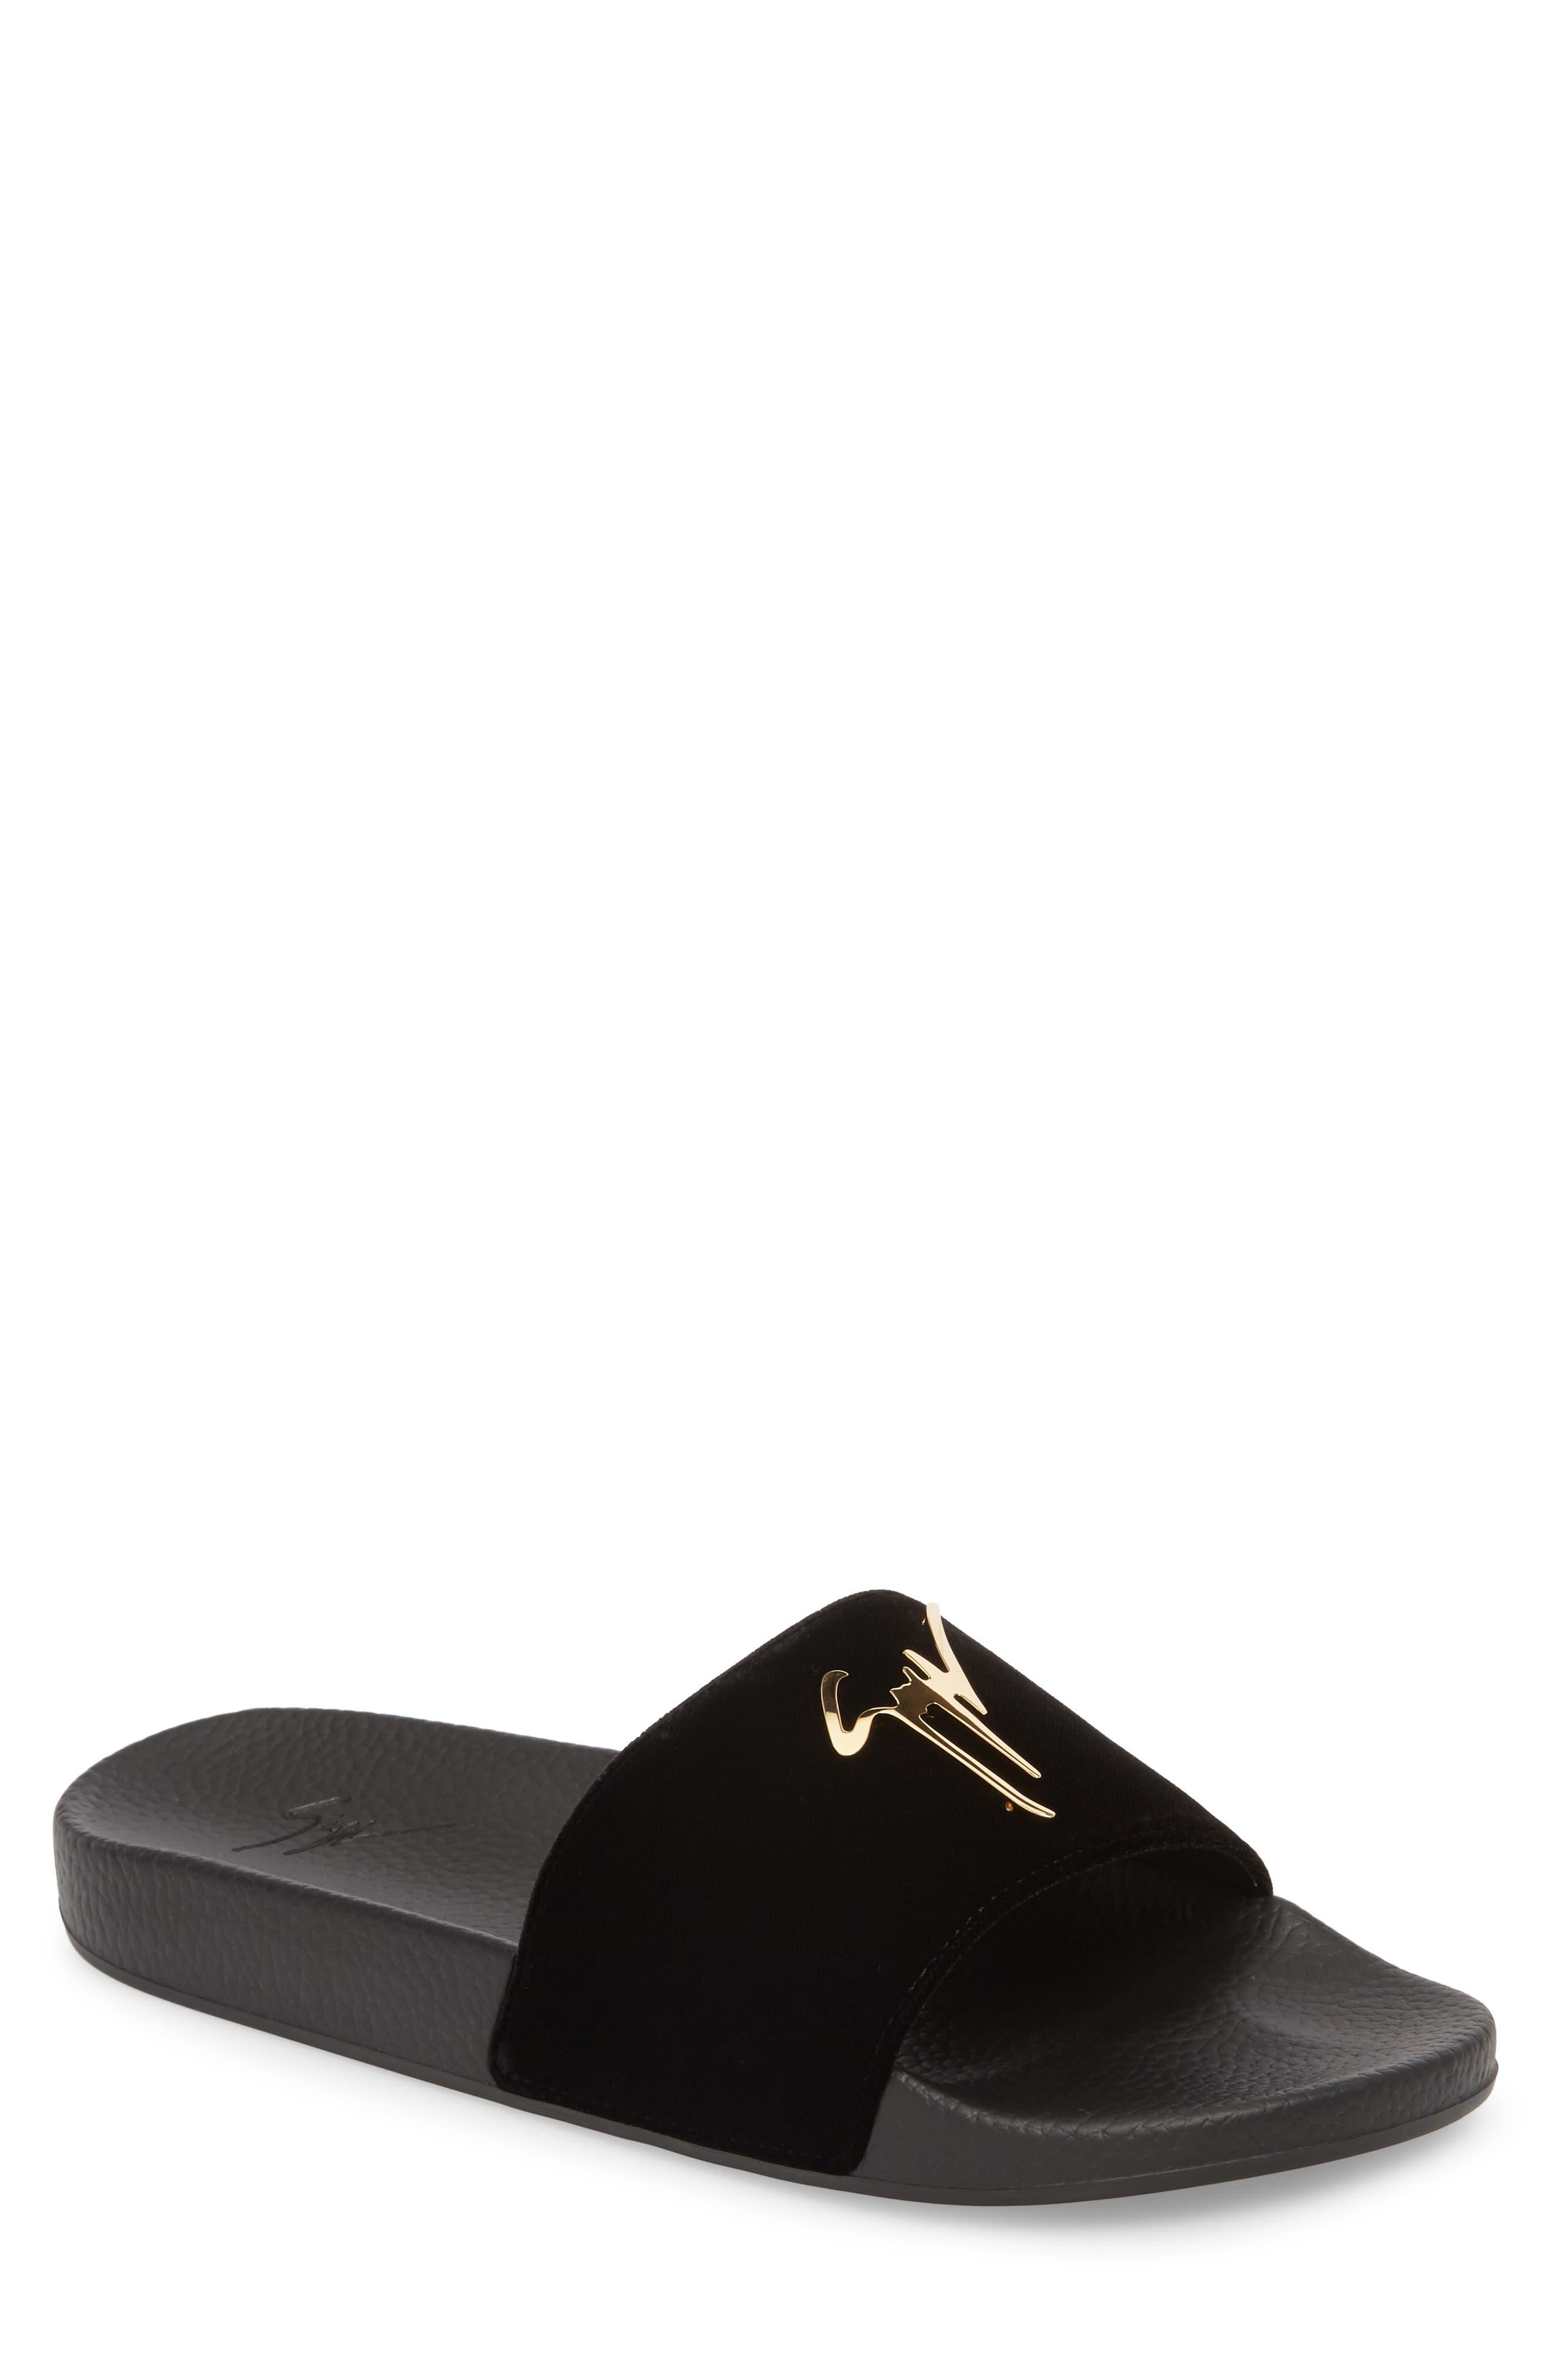 Slide Sandal,                         Main,                         color, Nero